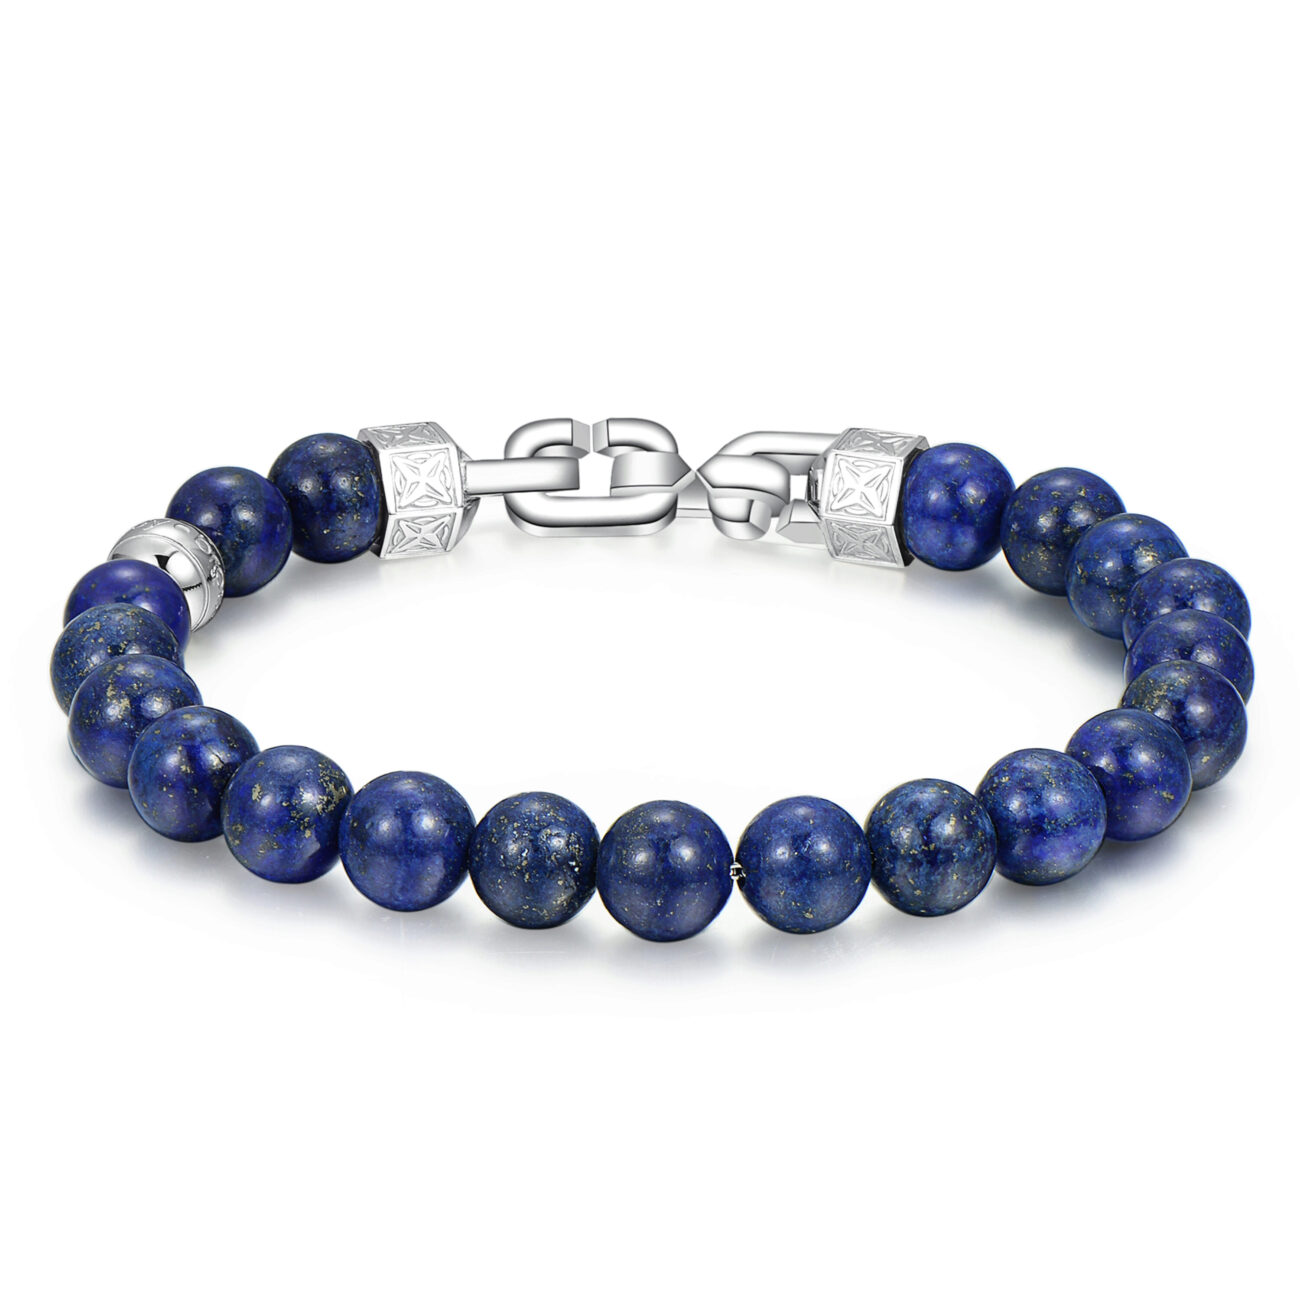 316 stainlees steel bracelet with lapislazzuli of 8mm.